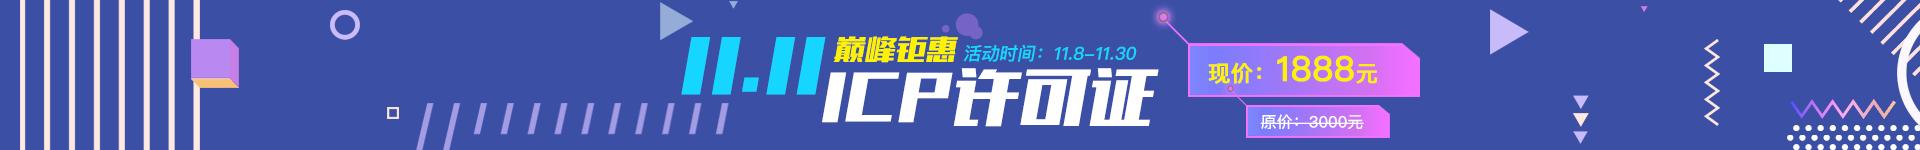 ICP许可证1888元